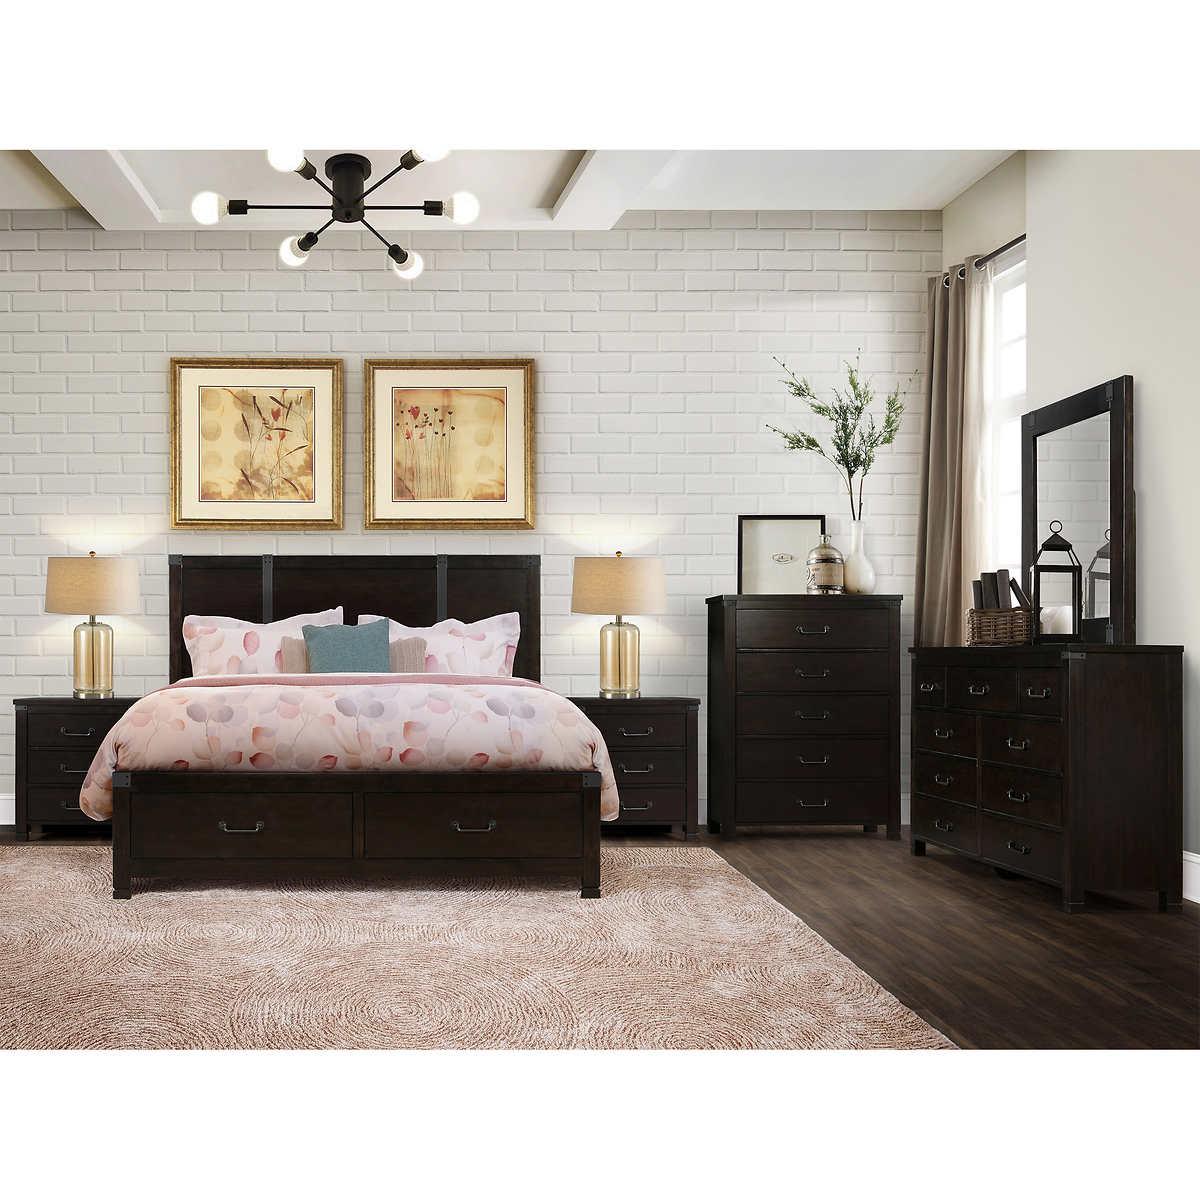 Towns 3-piece King Bedroom Set